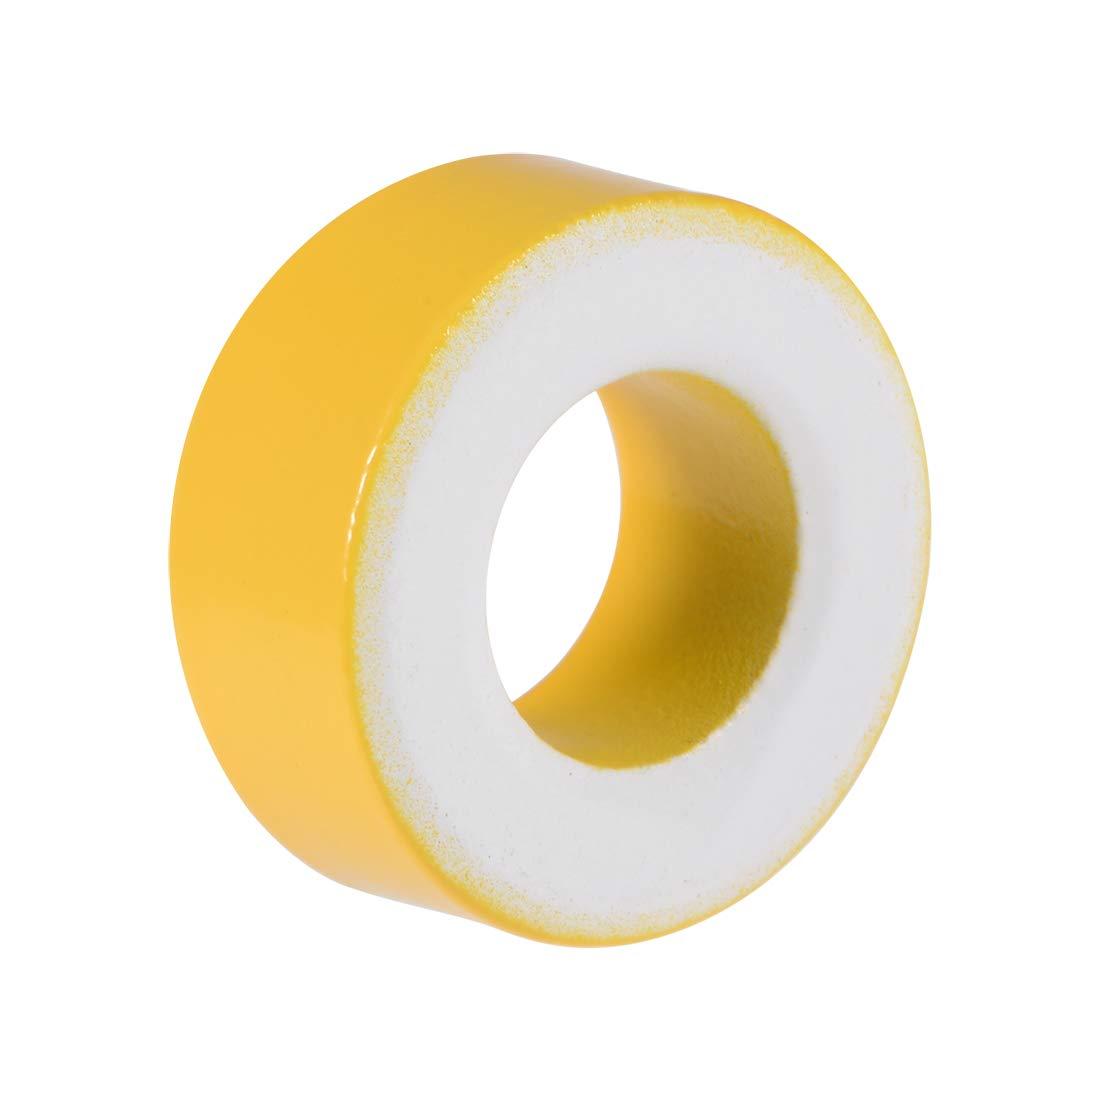 sourcing map 200pcs 7.4 x 13 x 5mm Ferrite Chokes Ring Iron Powder Toroid Cores Yellow White